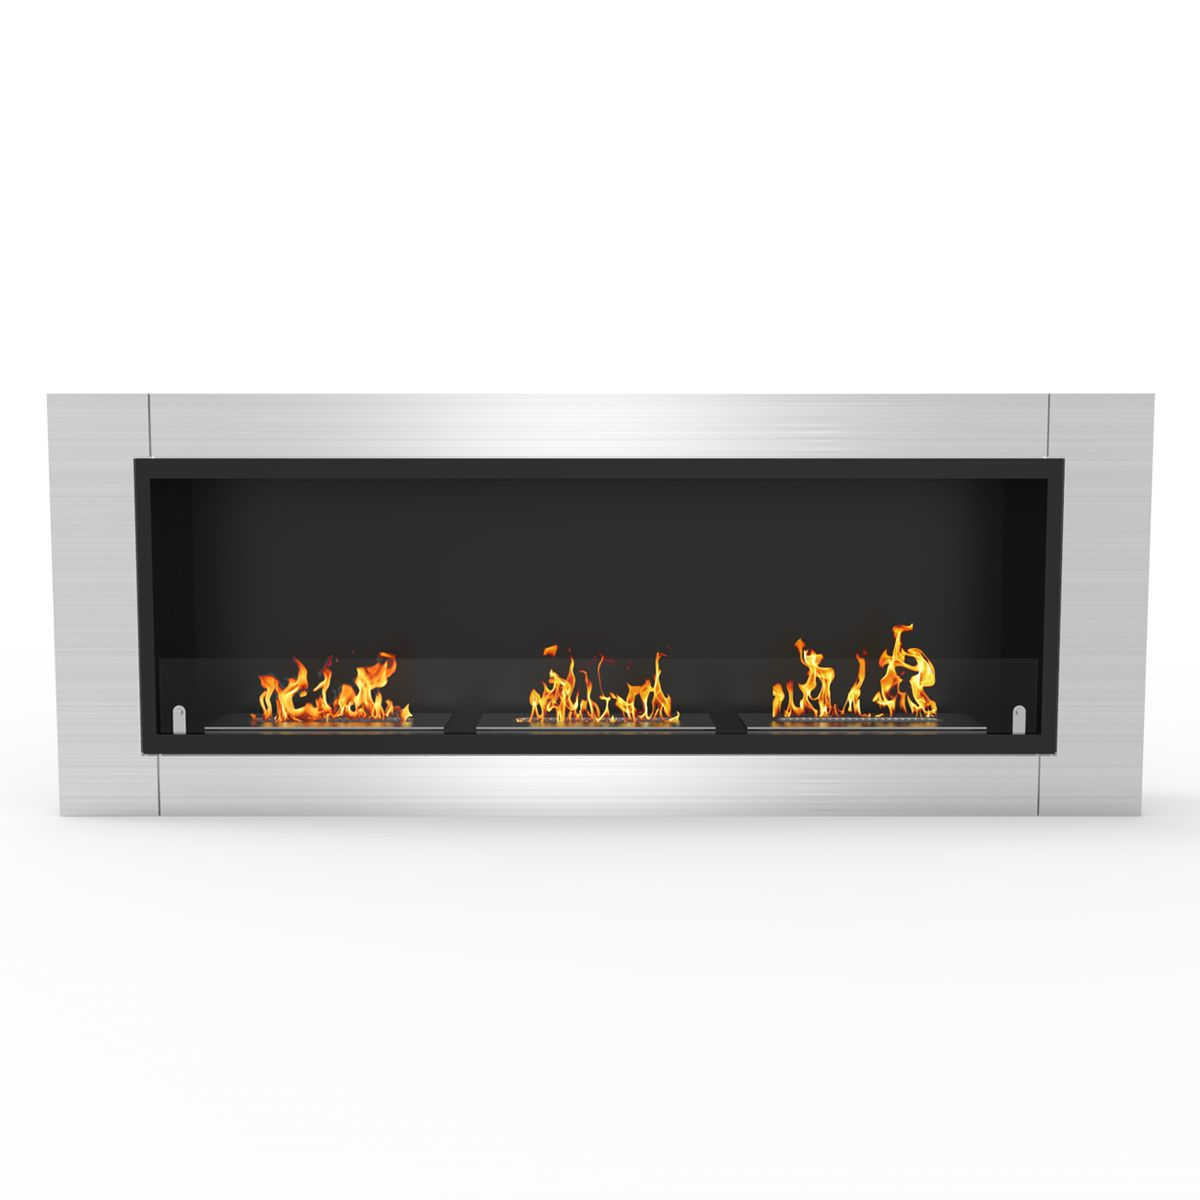 Er8002 Lenox 54 Inch Ventless Built In Recessed Bio Ethanol Wall Mounted Fireplace Ethanol Fireplace Bioethanol Fireplace